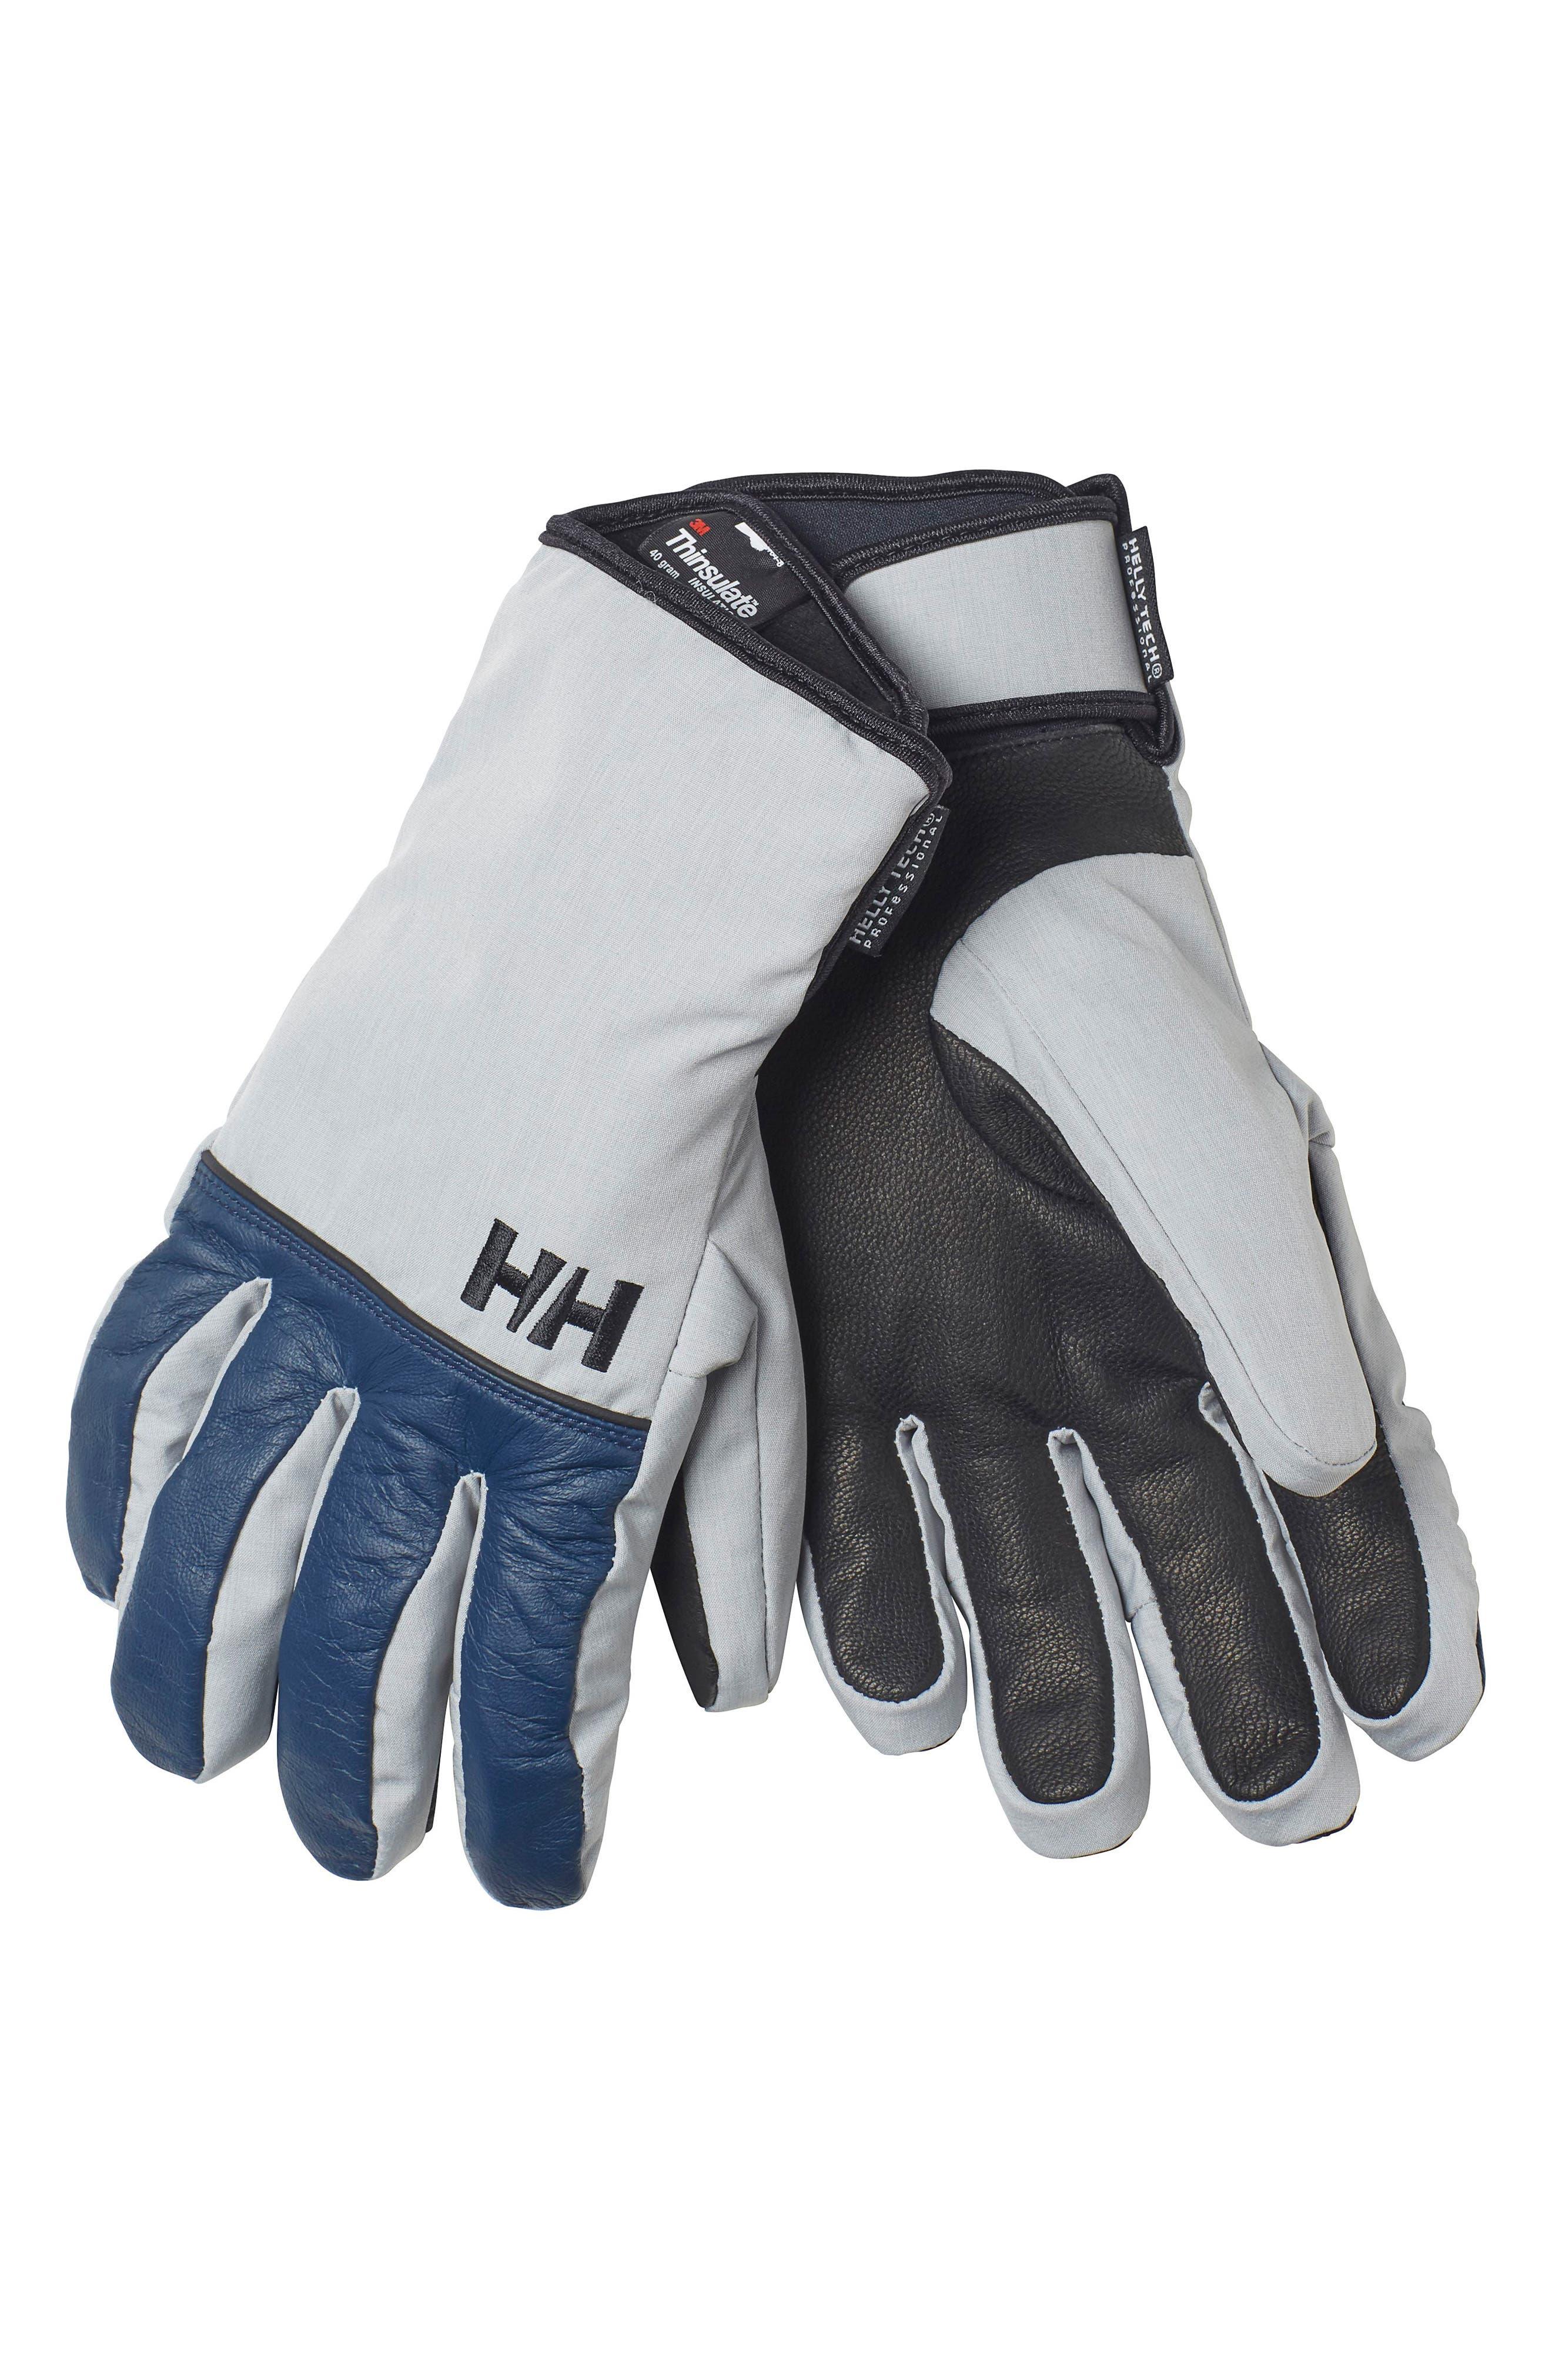 Rogue HT Gloves,                         Main,                         color, Evening Blue / Light Grey